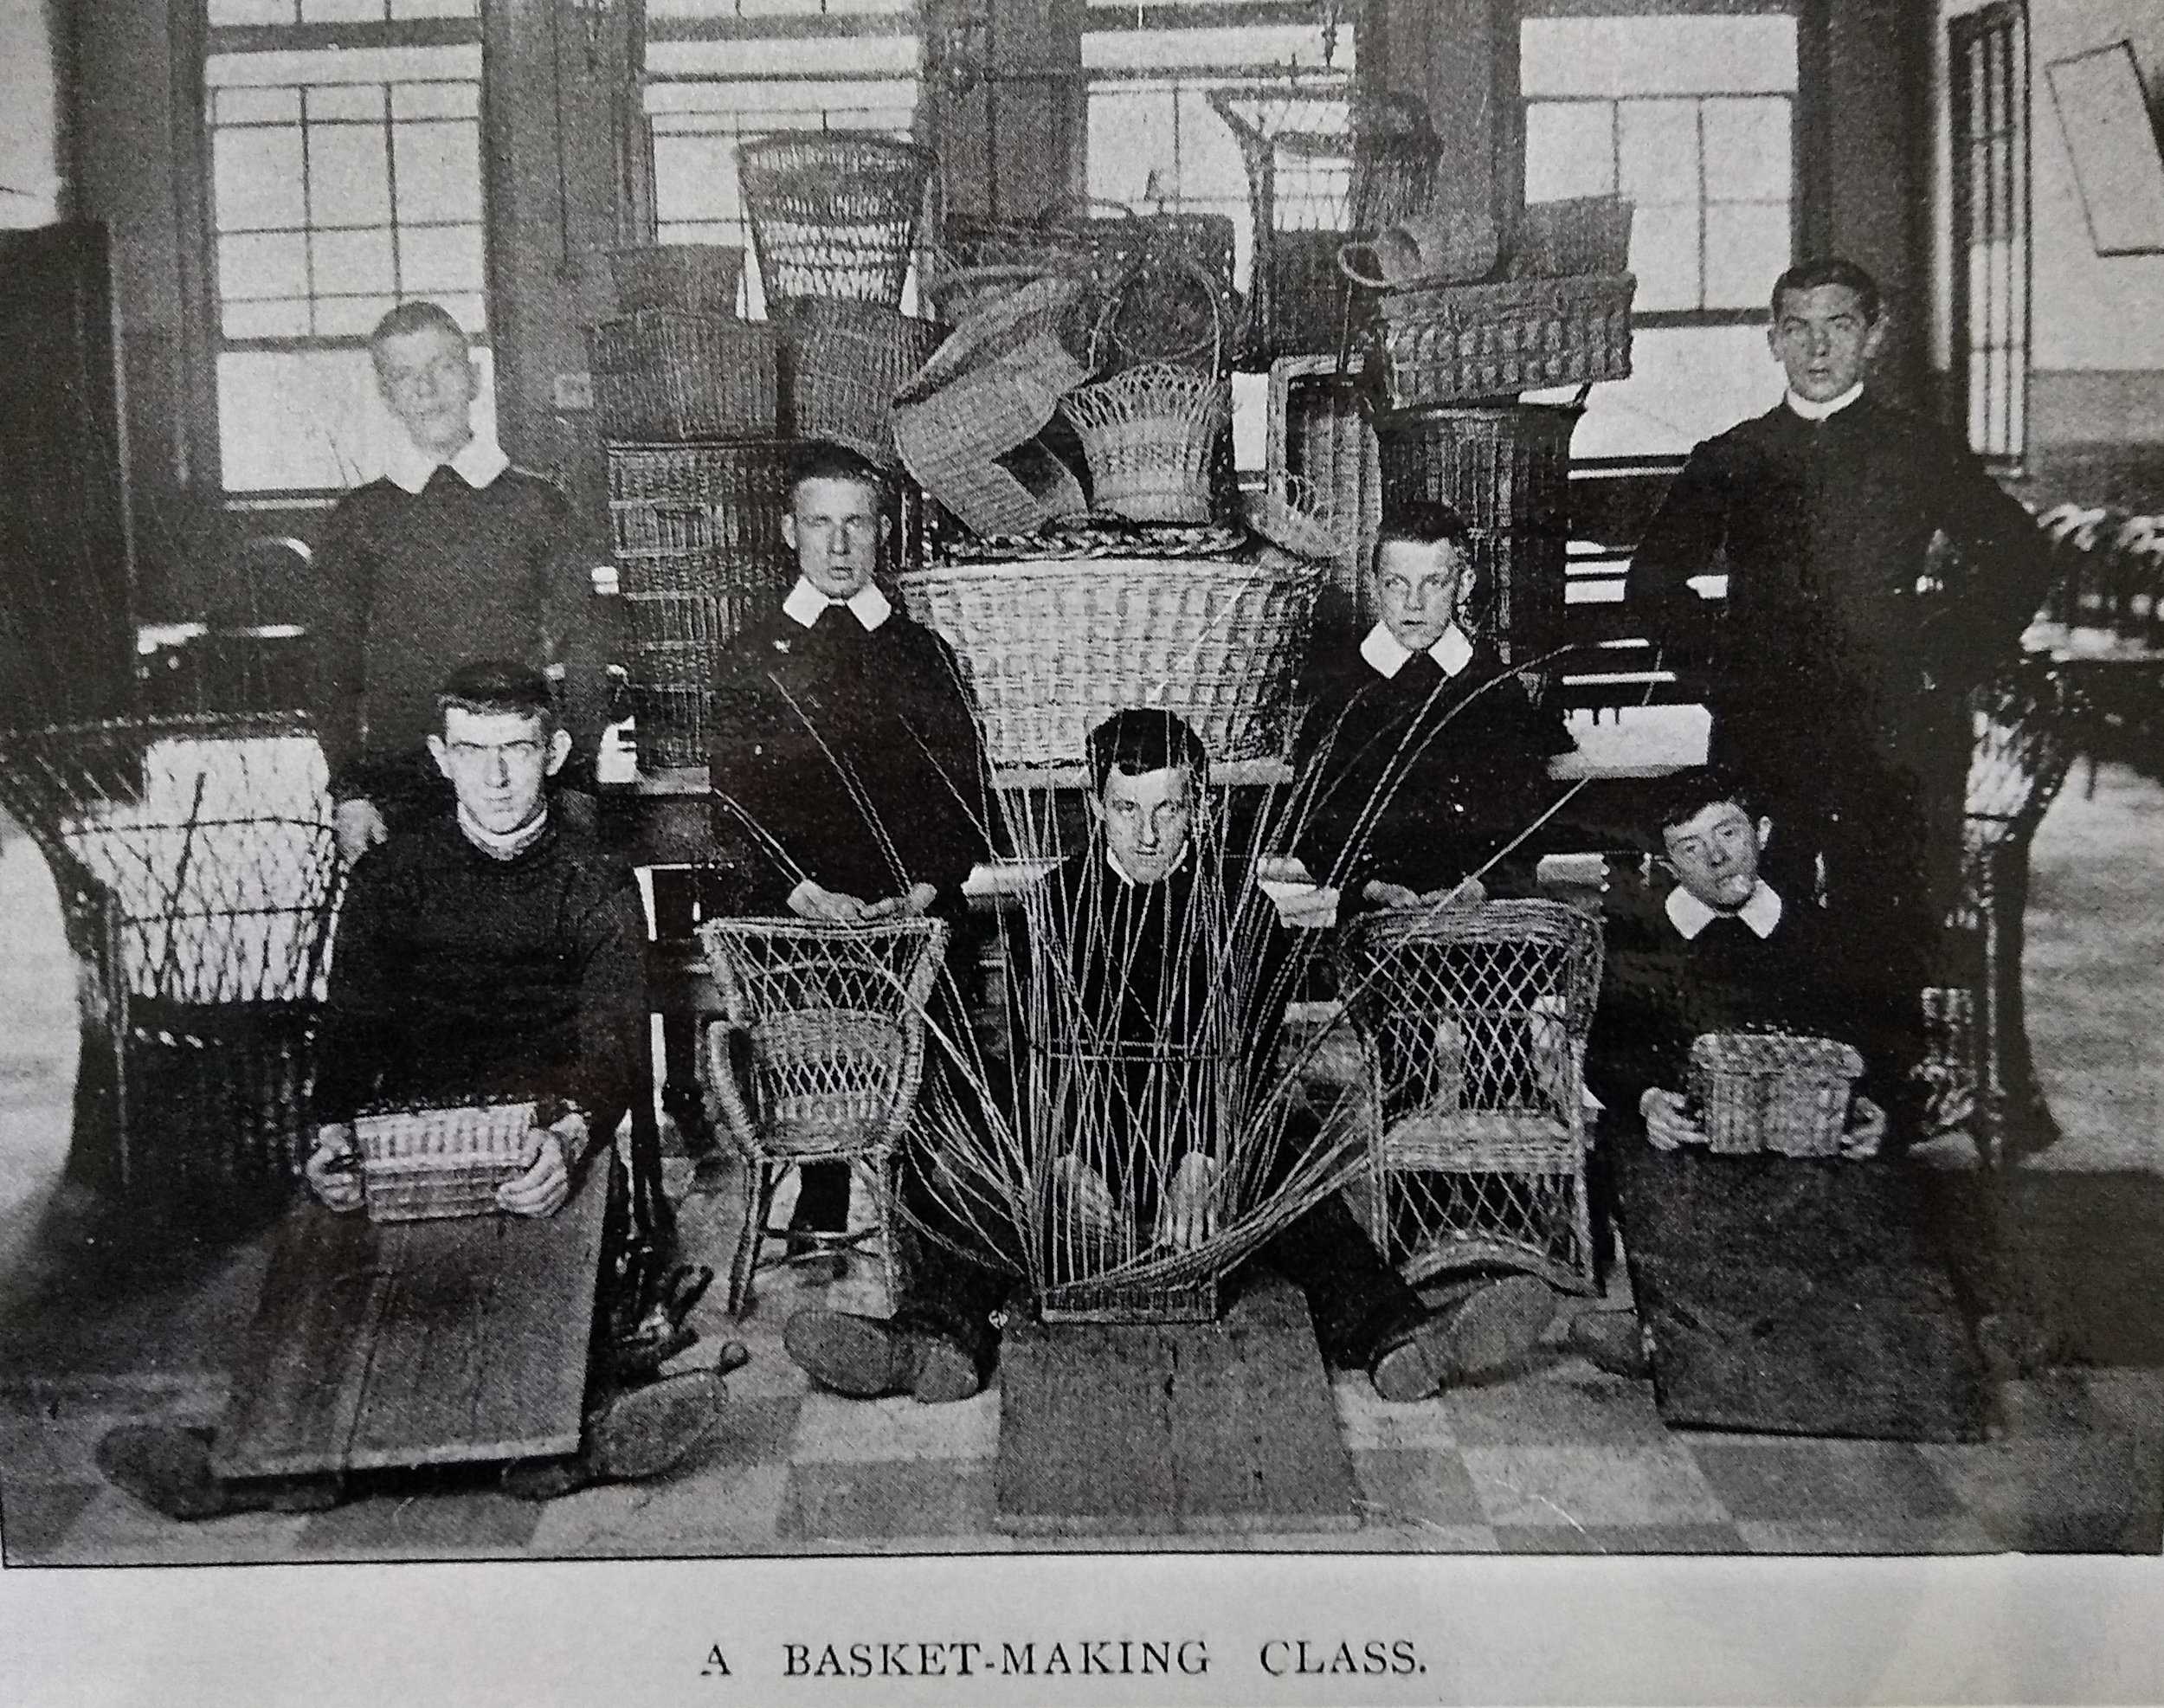 basket making class.jpg